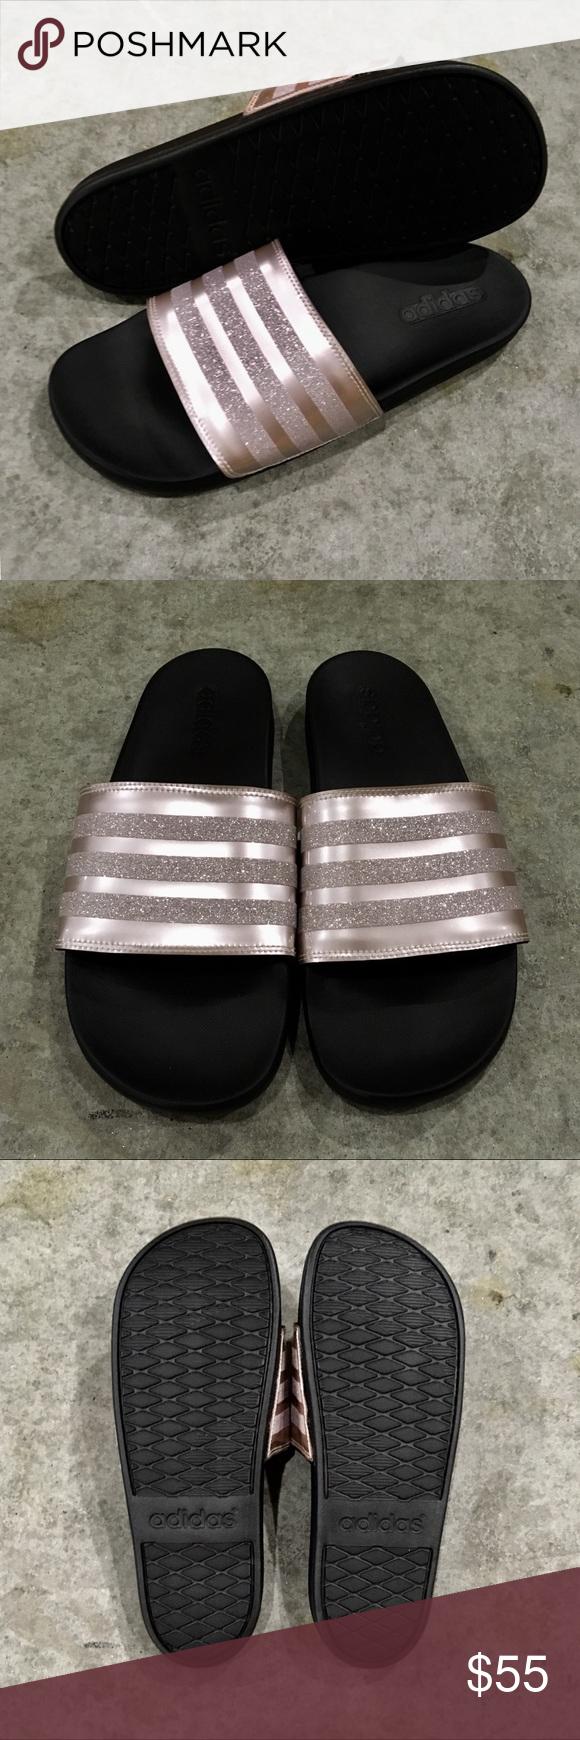 0baa108d156ad3 ADIDAS ADILETTE COMFORT CLOUDFOAM SLIDE SANDAL Women Adidas Adilette Comfort  Cloud Foam Slides Sandal Rose Gold